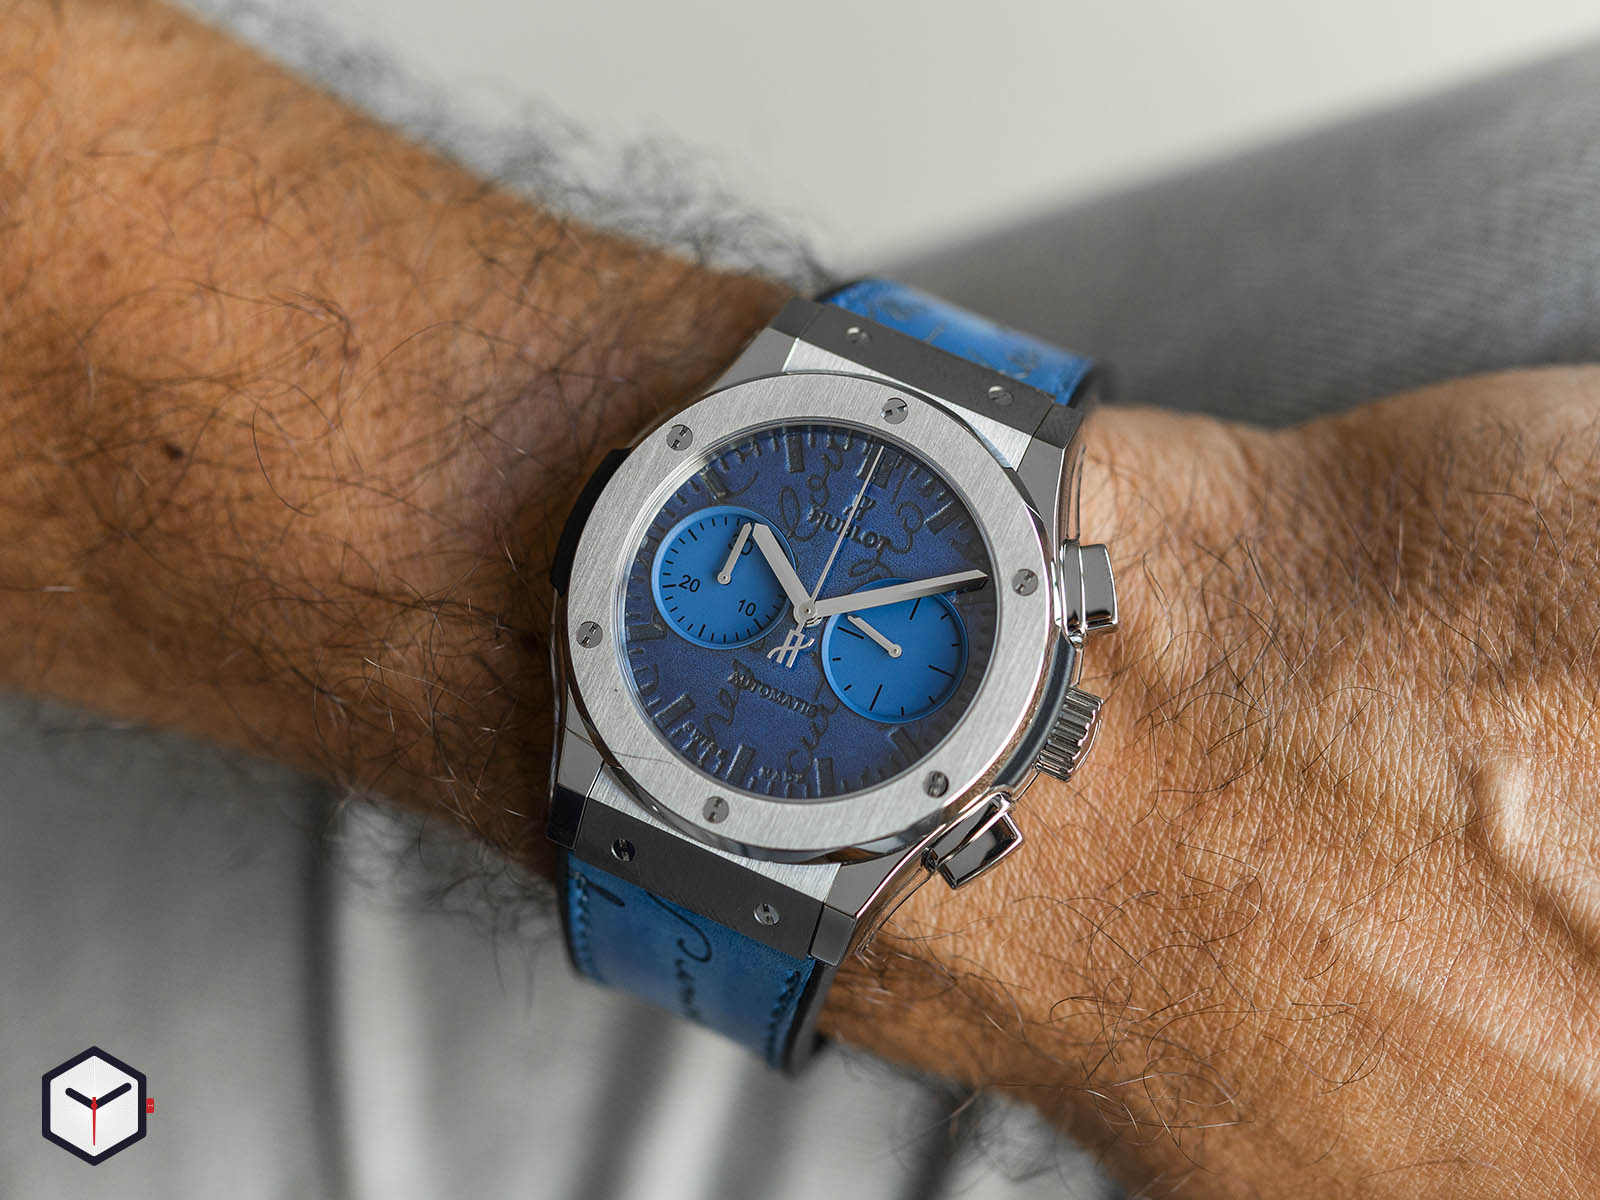 521-nx-050b-vr-ber18-hublot-classic-fusion-chronograph-berluti-scritto-ocean-blue-45mm-10.jpg